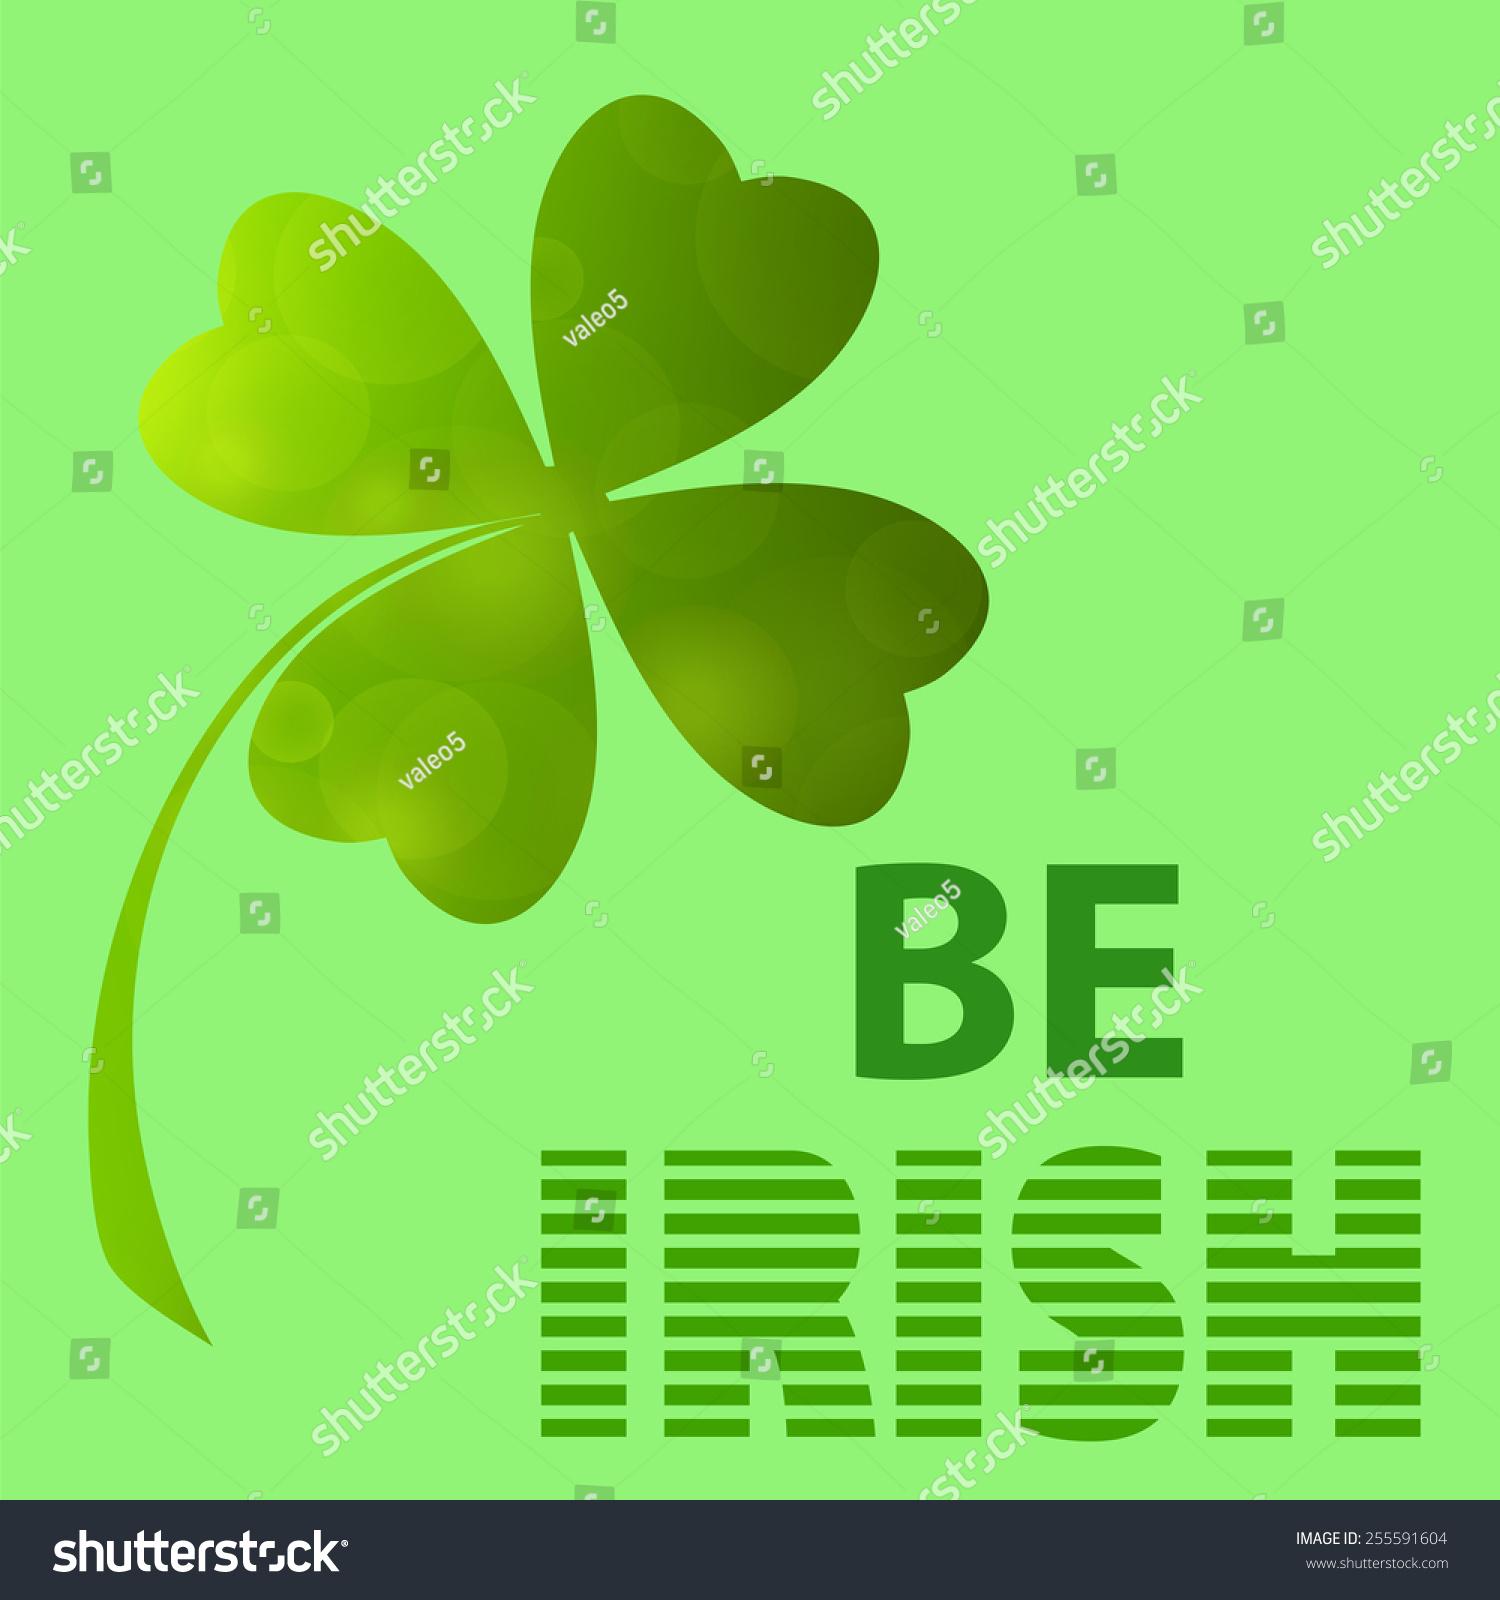 Four leaf clover irish shamrock st stock illustration 255591604 four leaf clover irish shamrock st stock illustration 255591604 shutterstock biocorpaavc Gallery